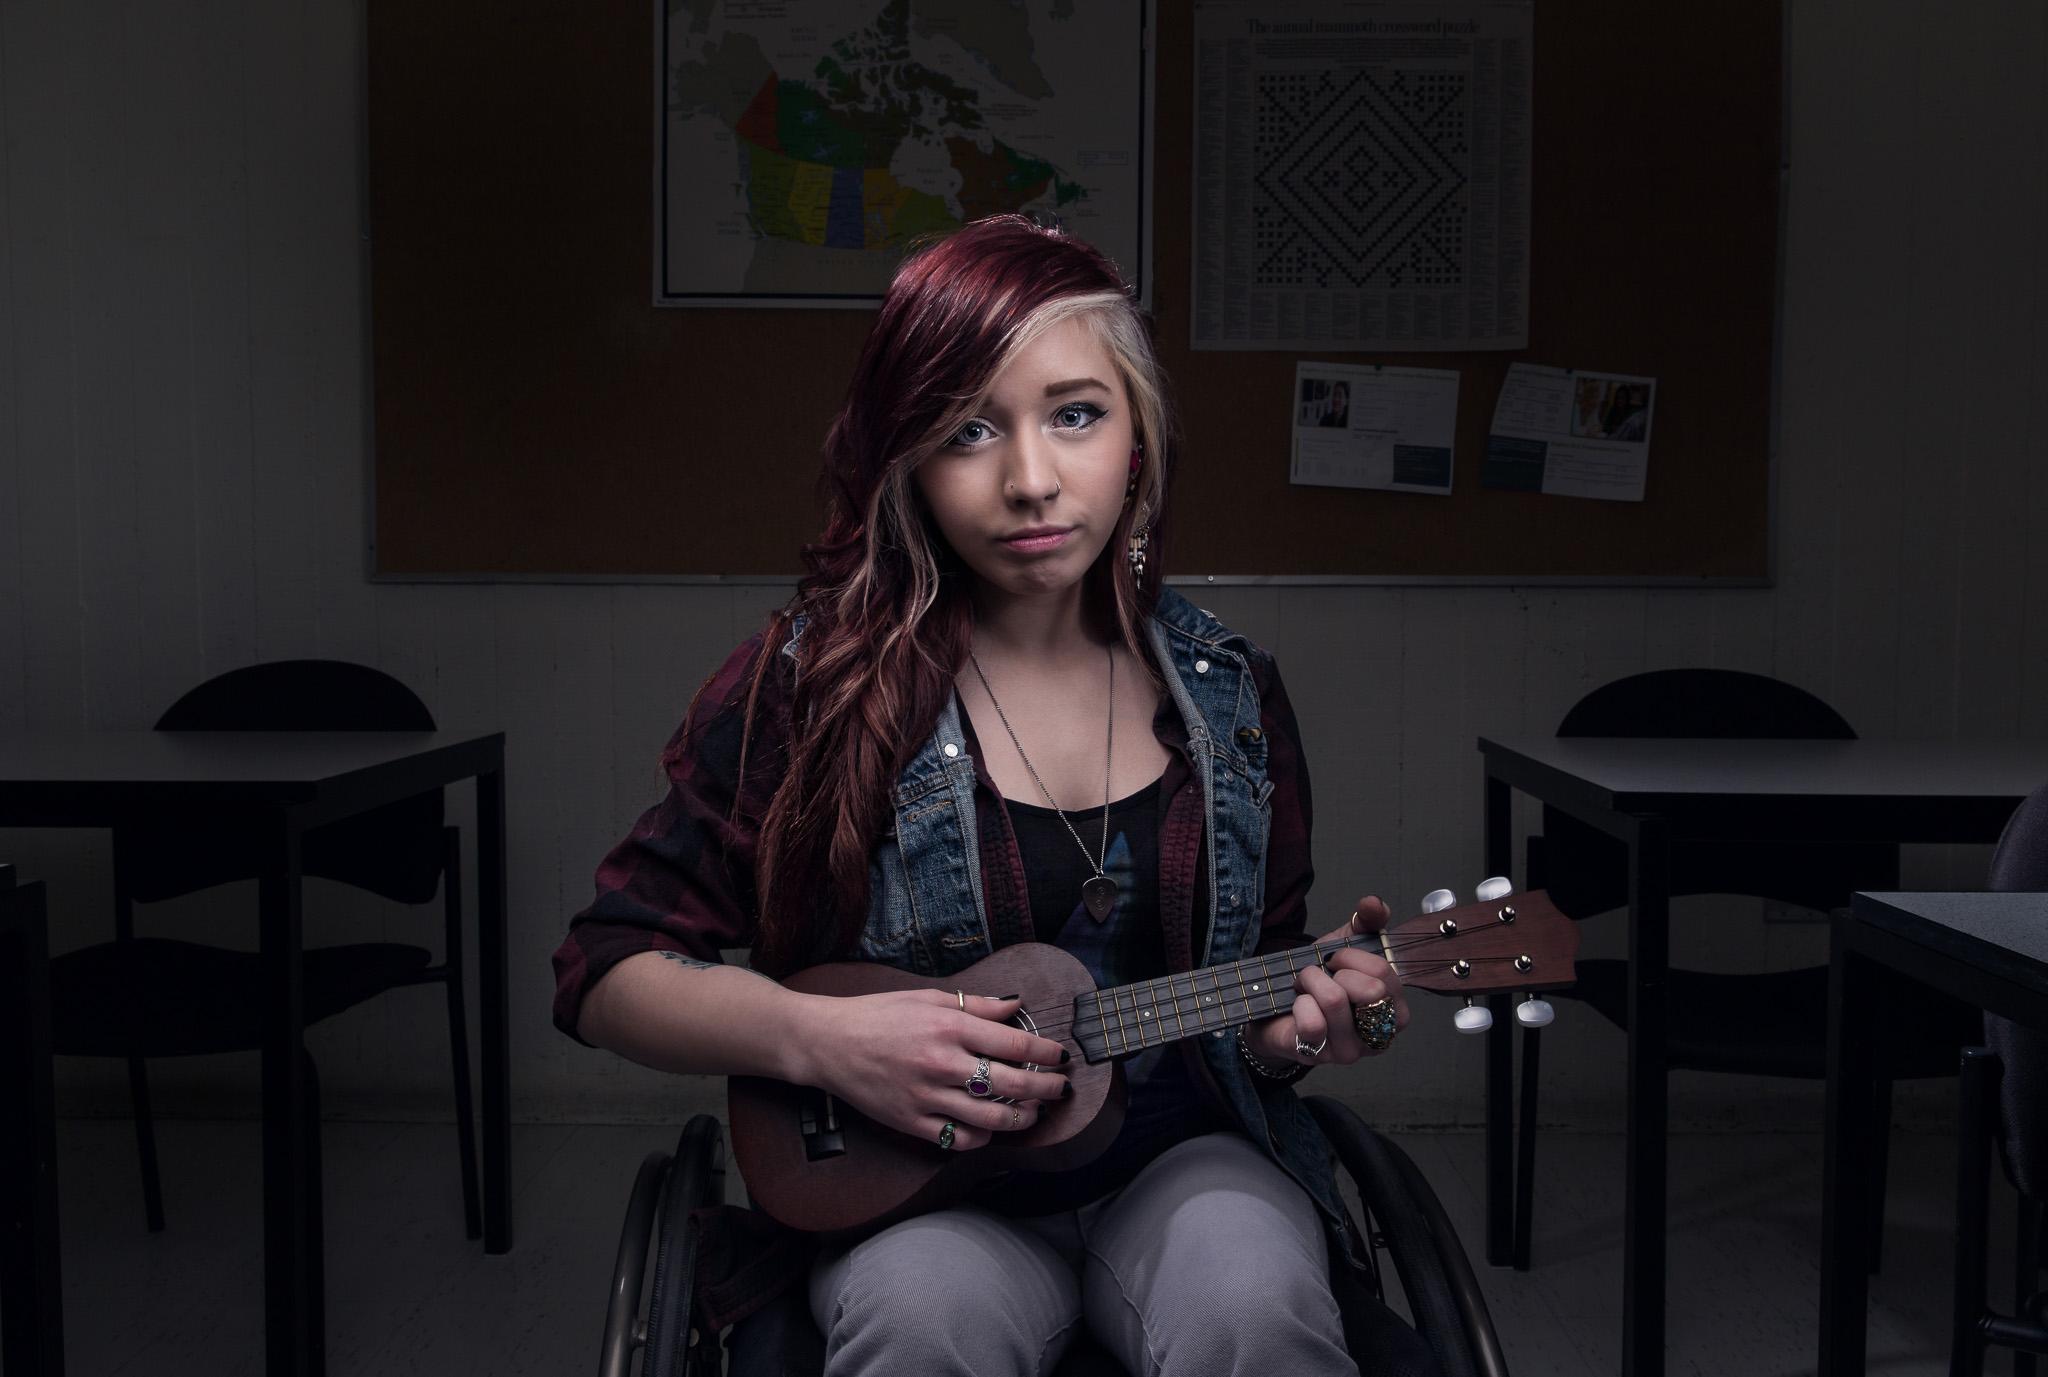 Ottawa_Portrait_Photographer_Justin_Van_Leeuwen--47-SarahMercer-Edit